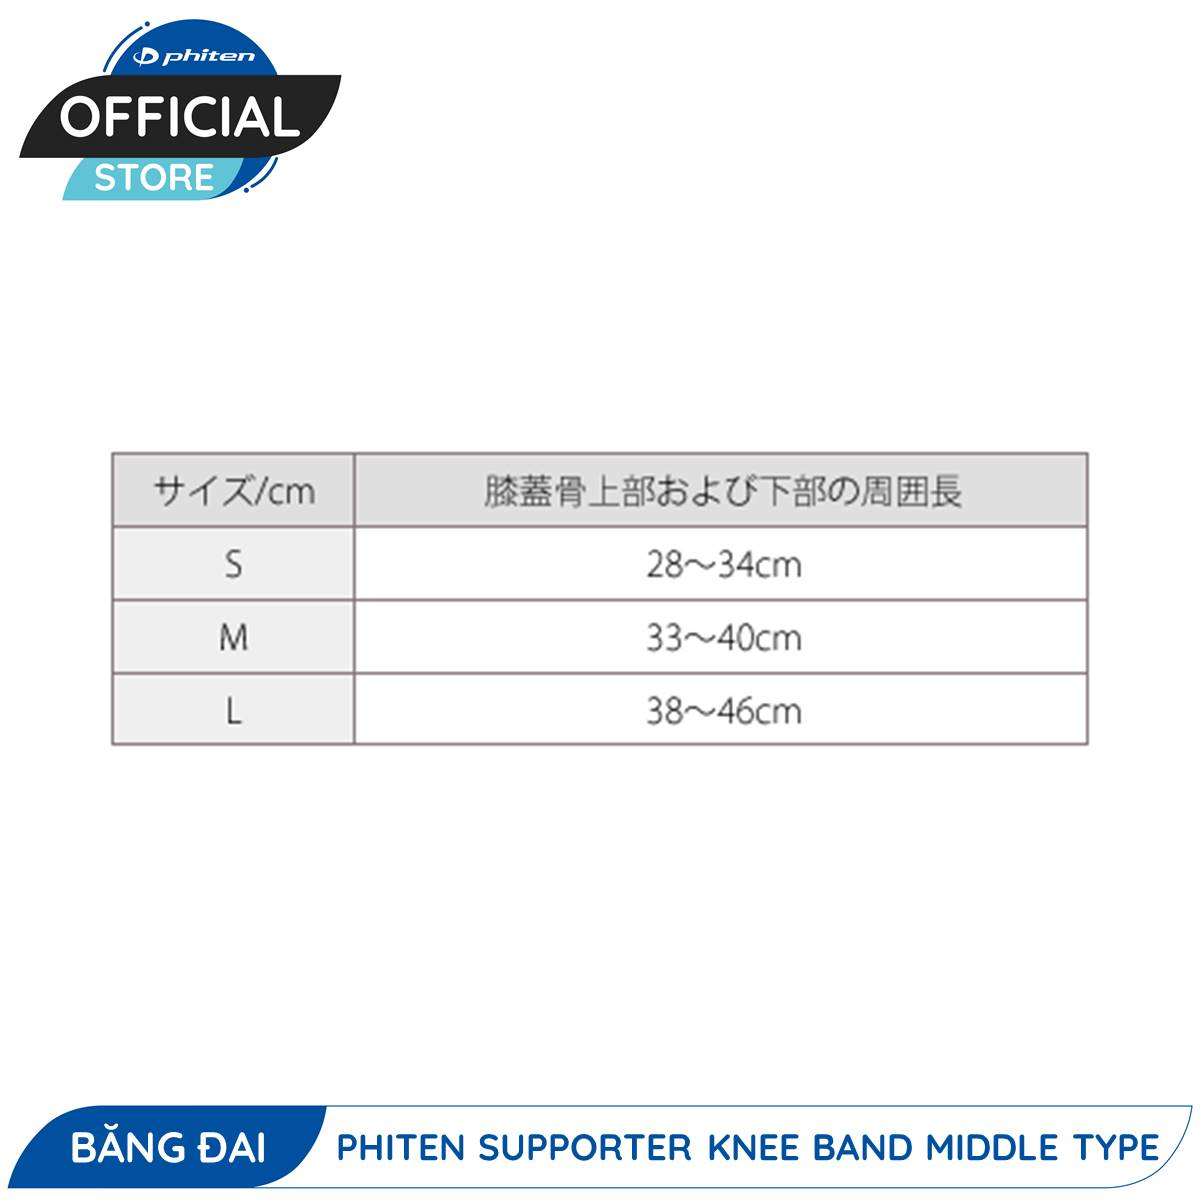 Băng Bảo Vệ Gối Phiten Supporter Knee Band Middle Type (Loại Vừa)